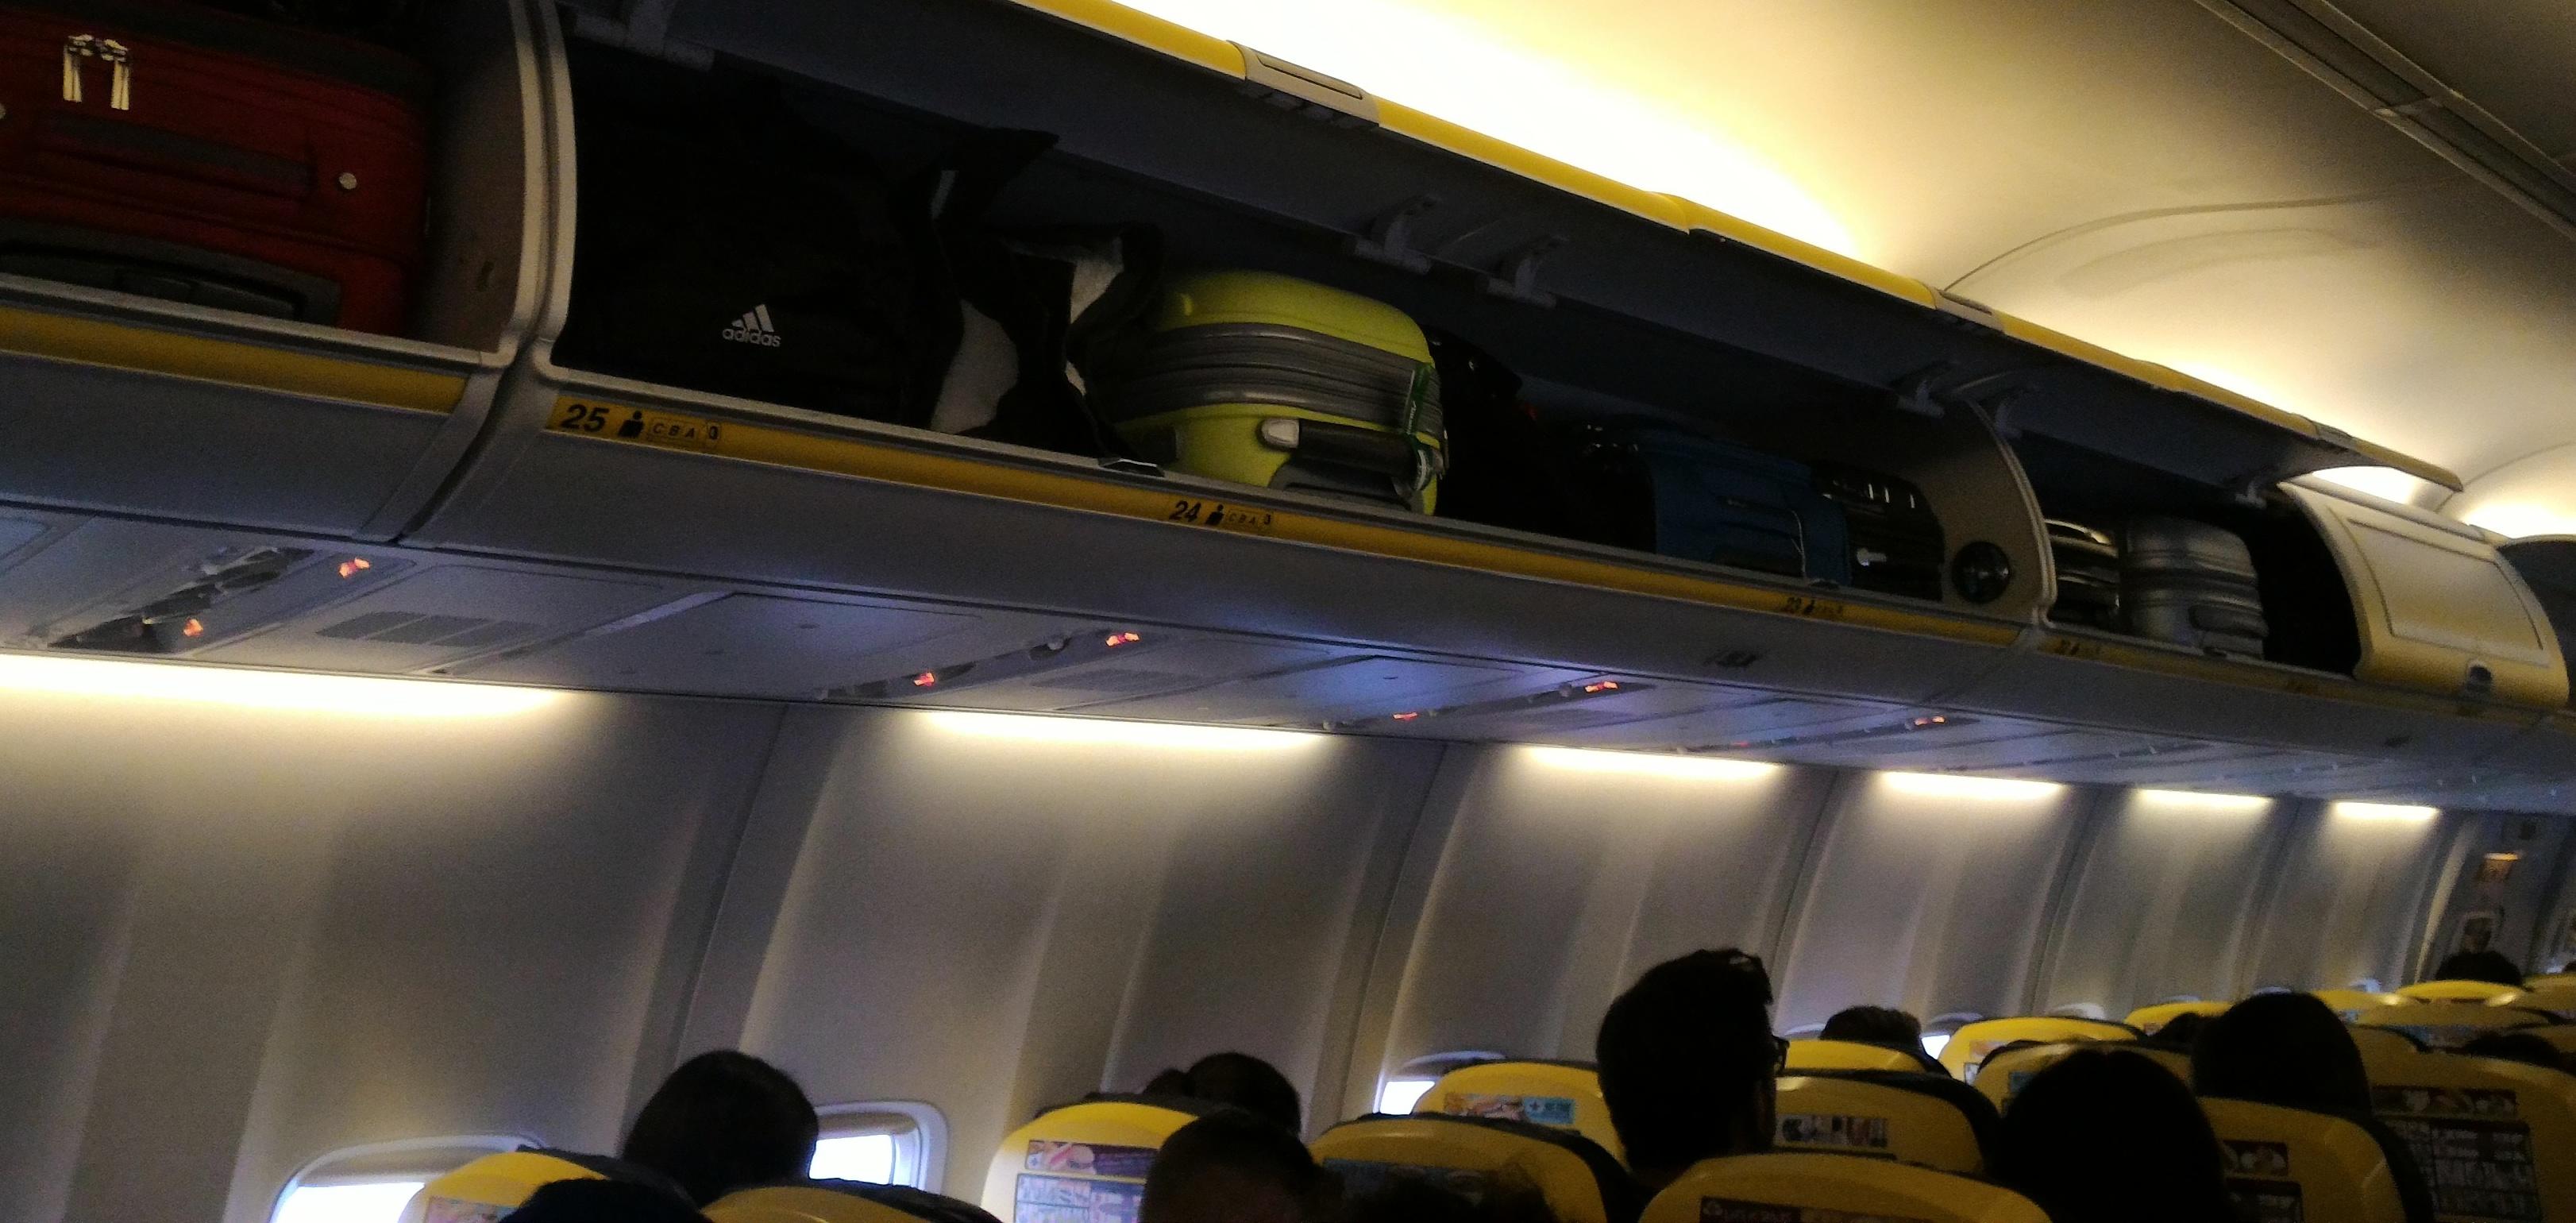 Ryanair dal 15 gennaio 2018 parte la nuova policy per i bagagli a mano in cabina webitmag - Cabina ryanair ...